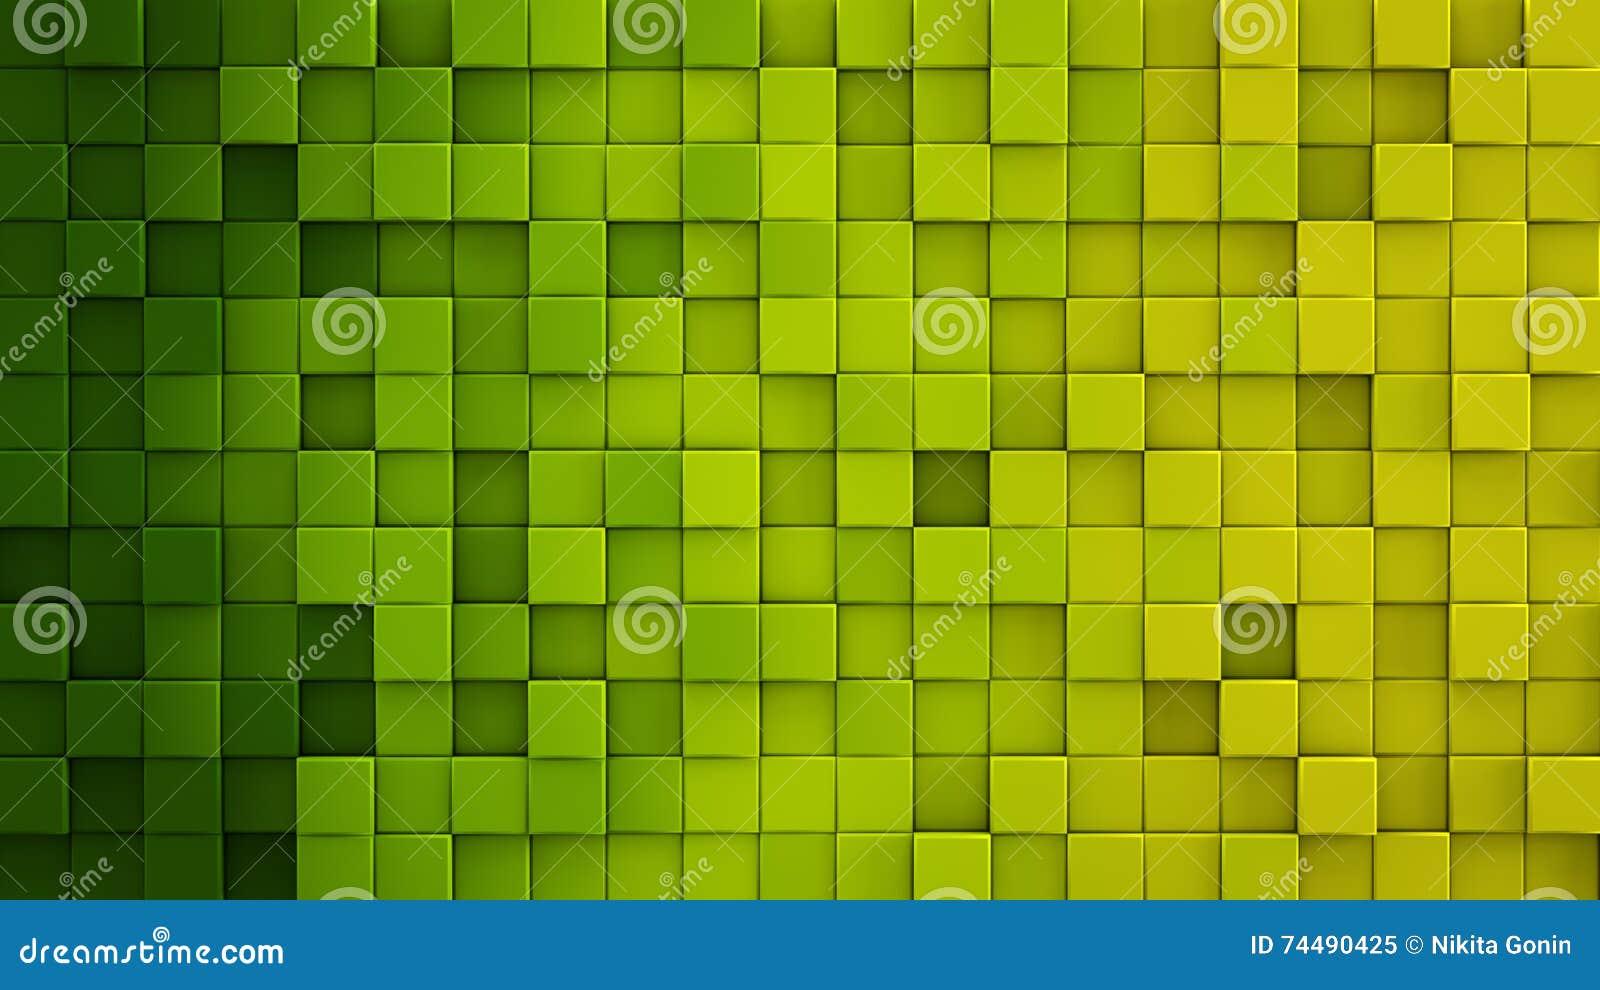 Yellow green gradient cubes 3D render